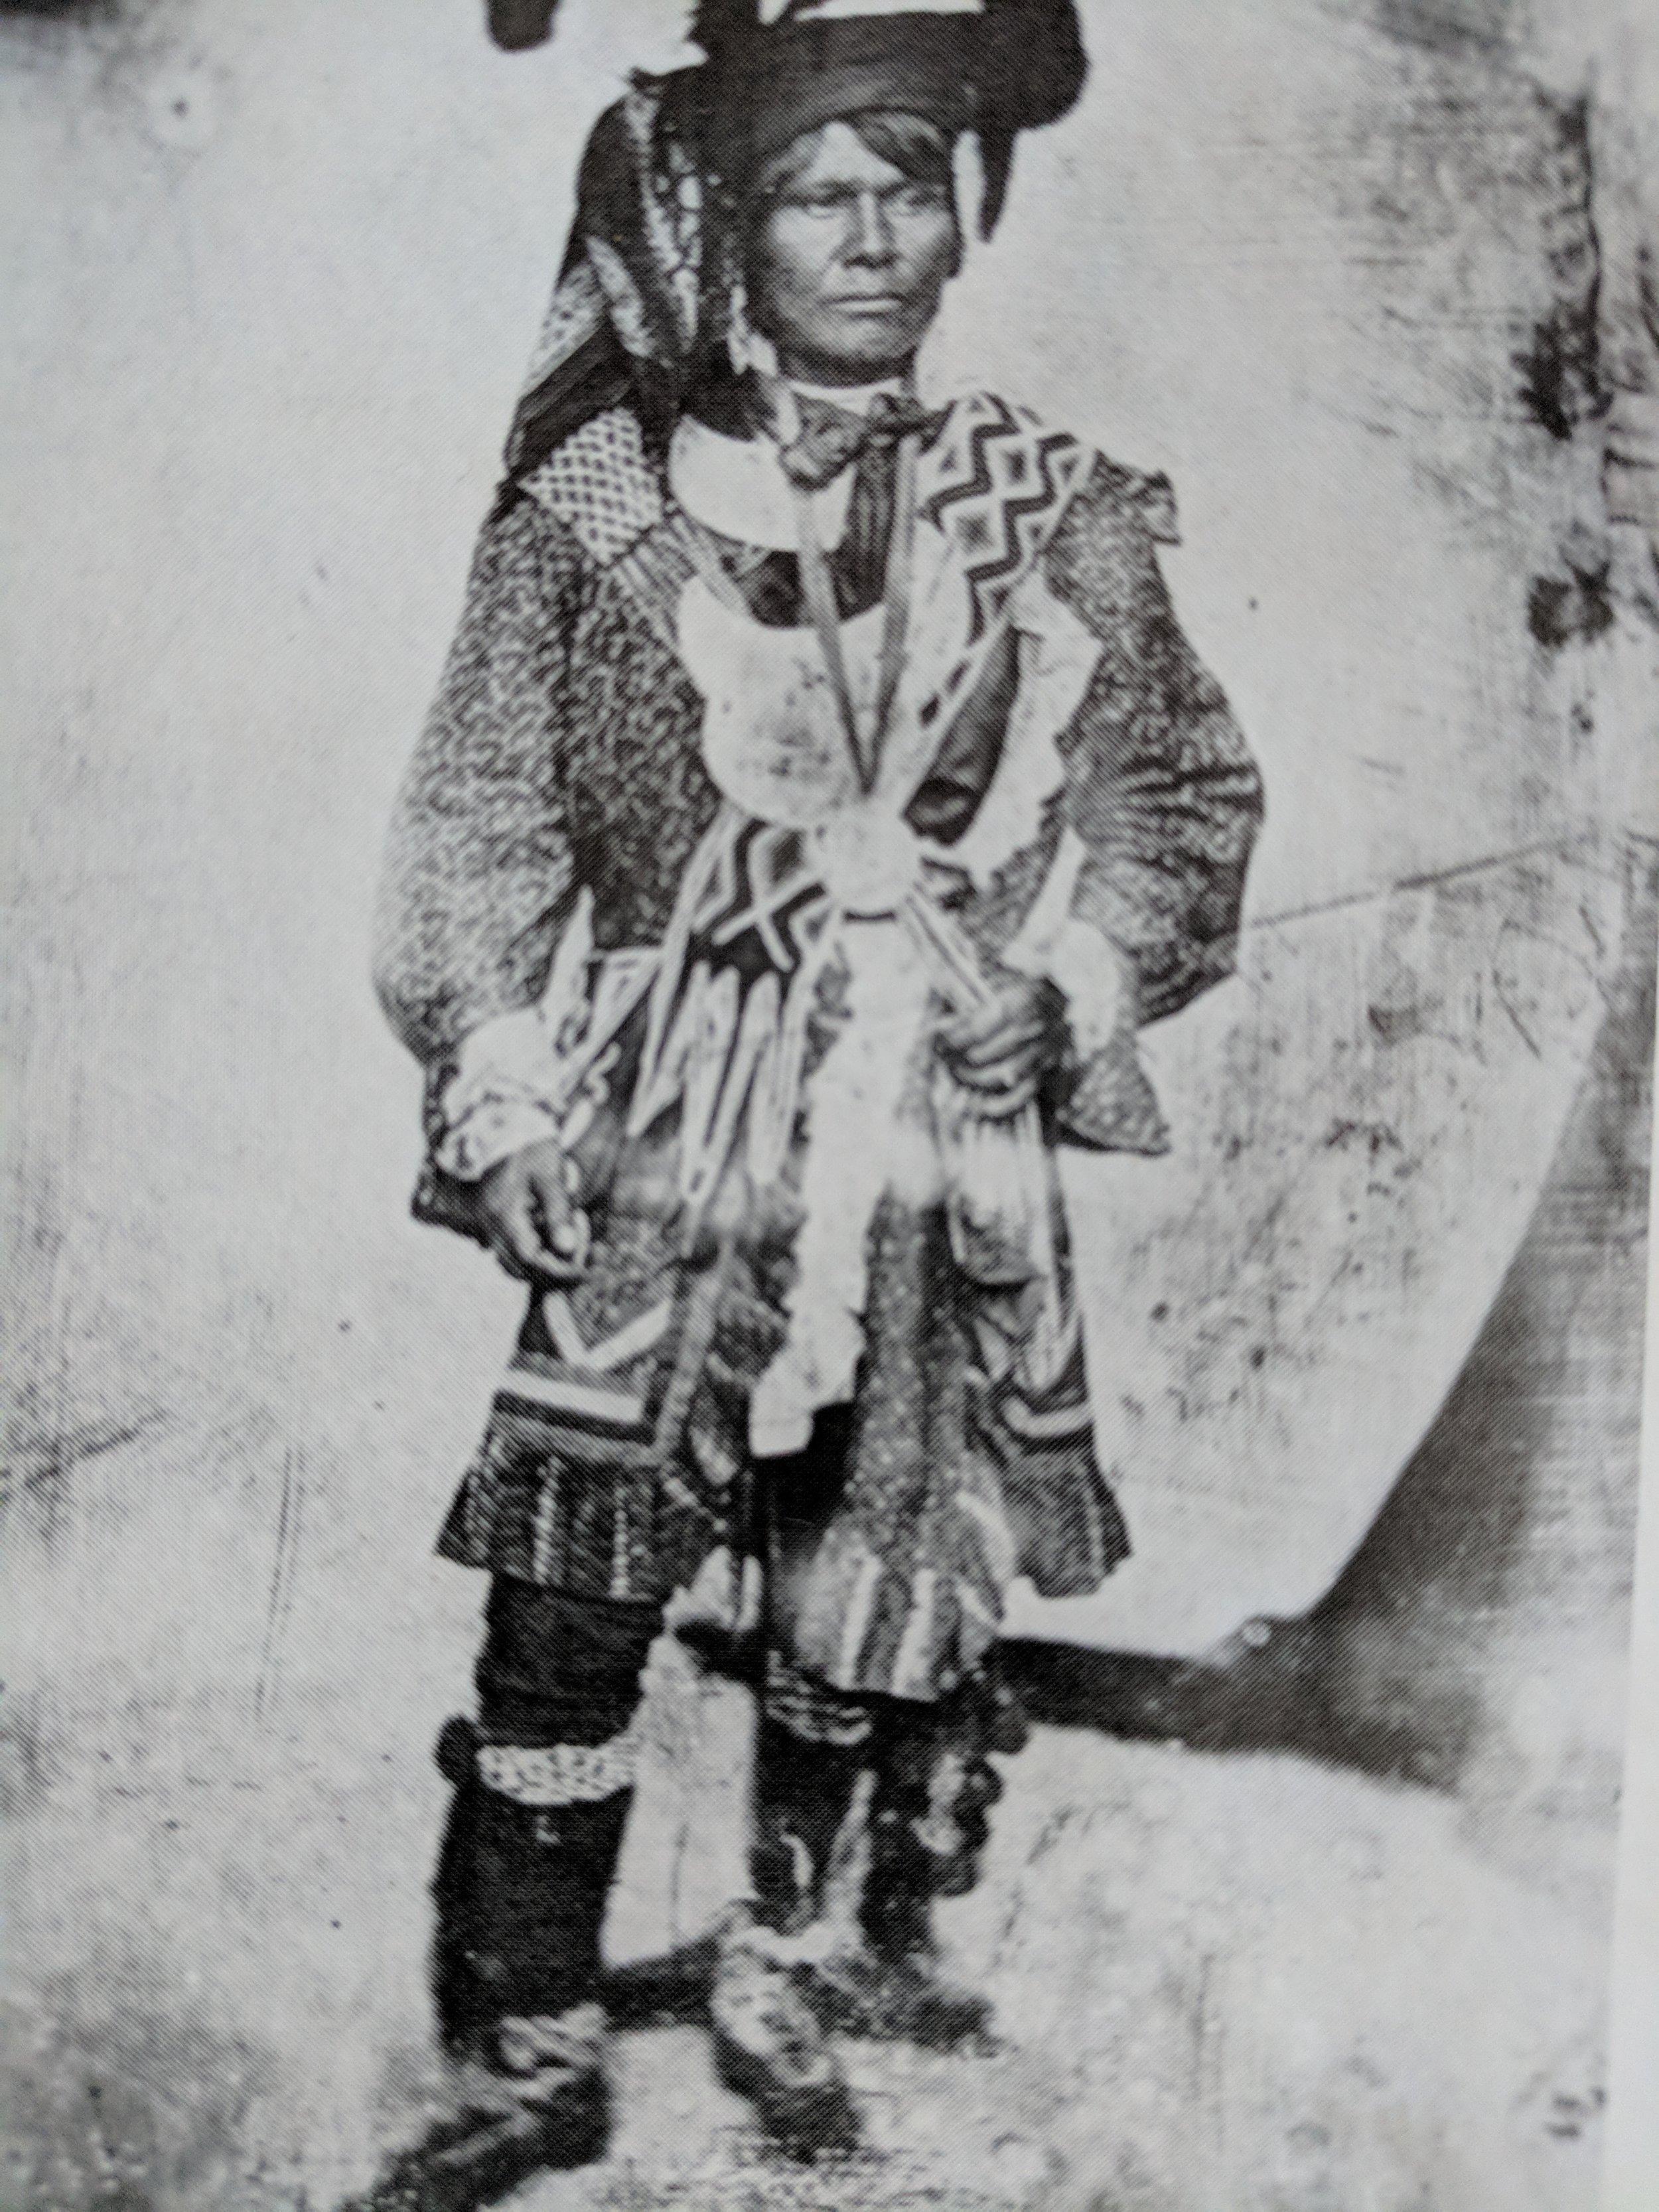 Chief Bill Bowlegs